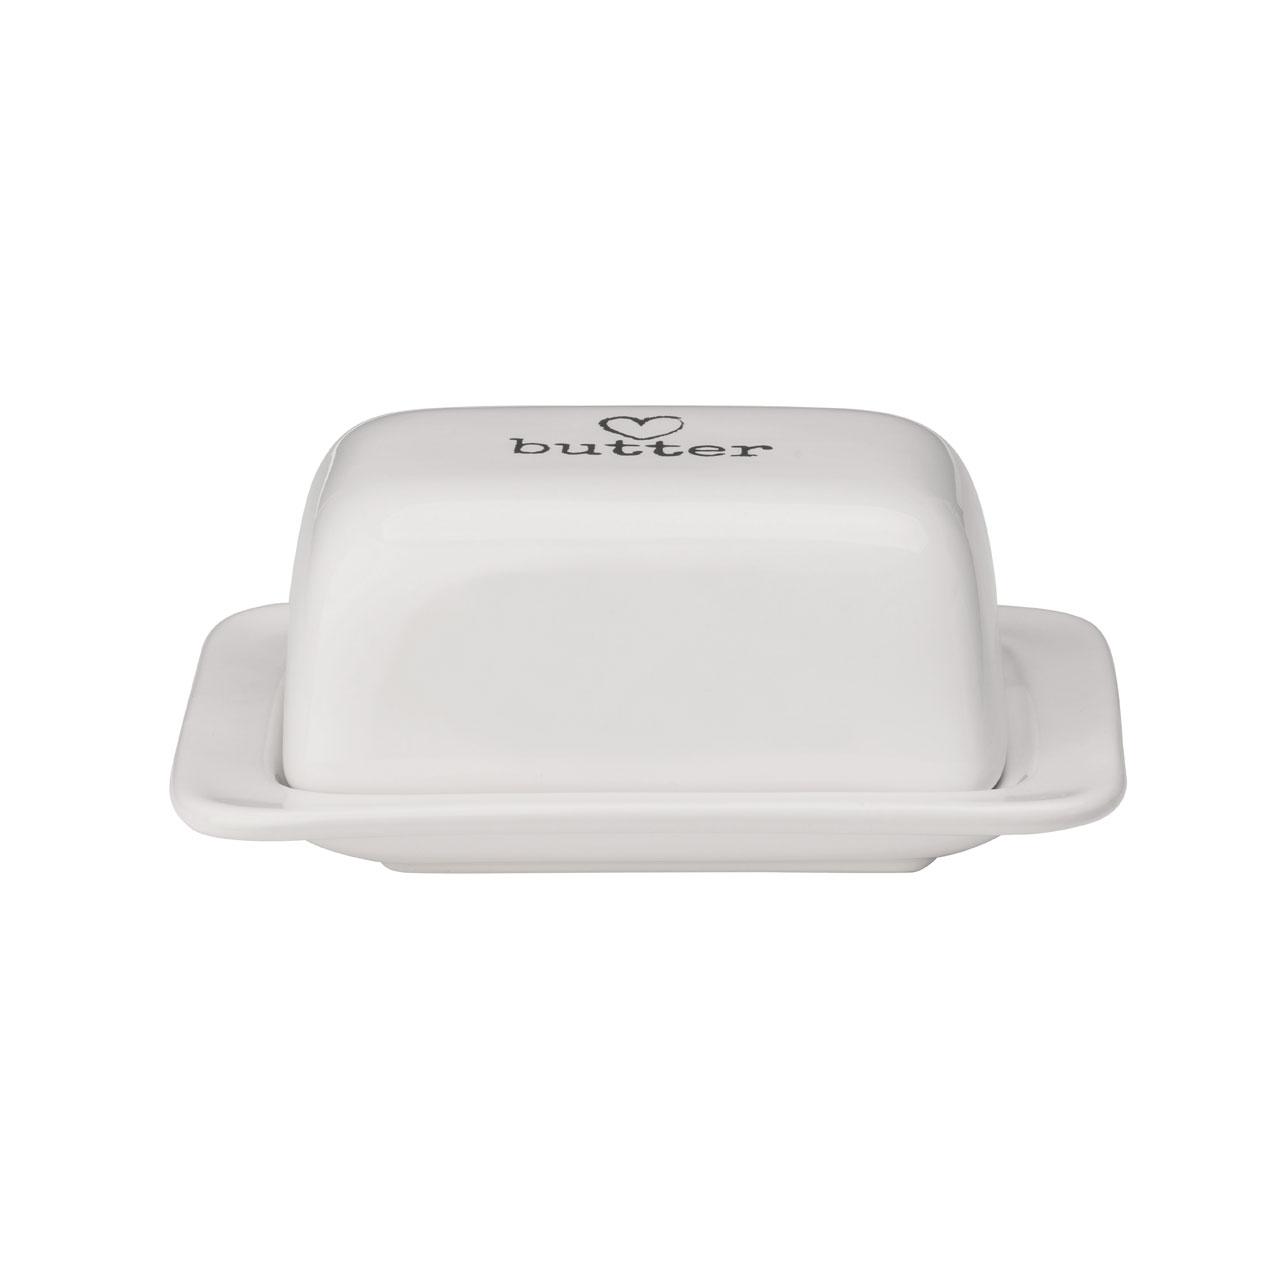 white ceramic charm butter dish airtight lid decorative modern  - white ceramic charm butter dish airtight lid decorative modern love heart